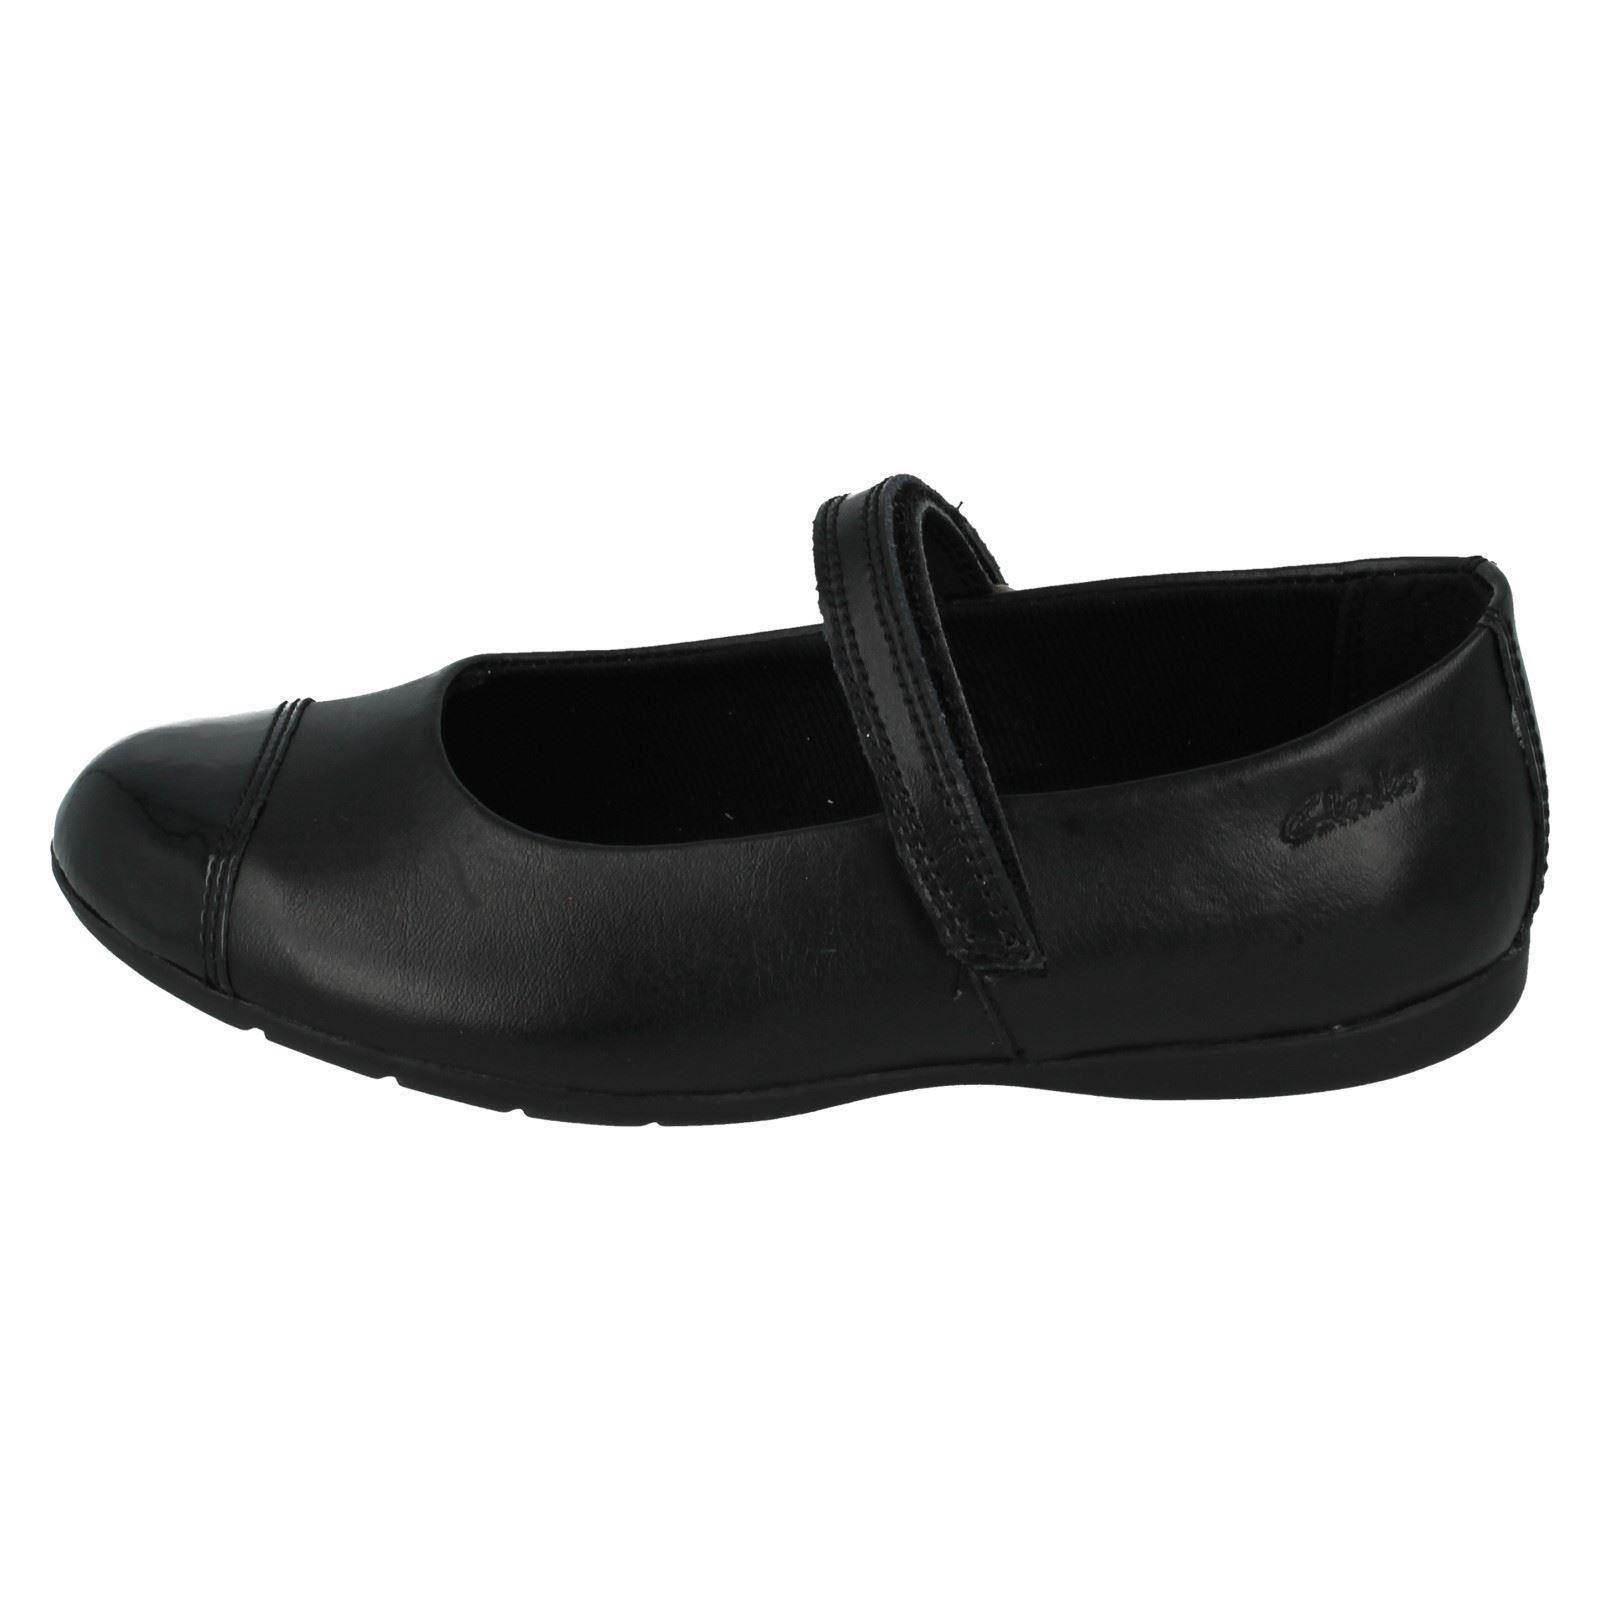 Girls Clarks Dance StepvSmart Leather School Shoes ~K